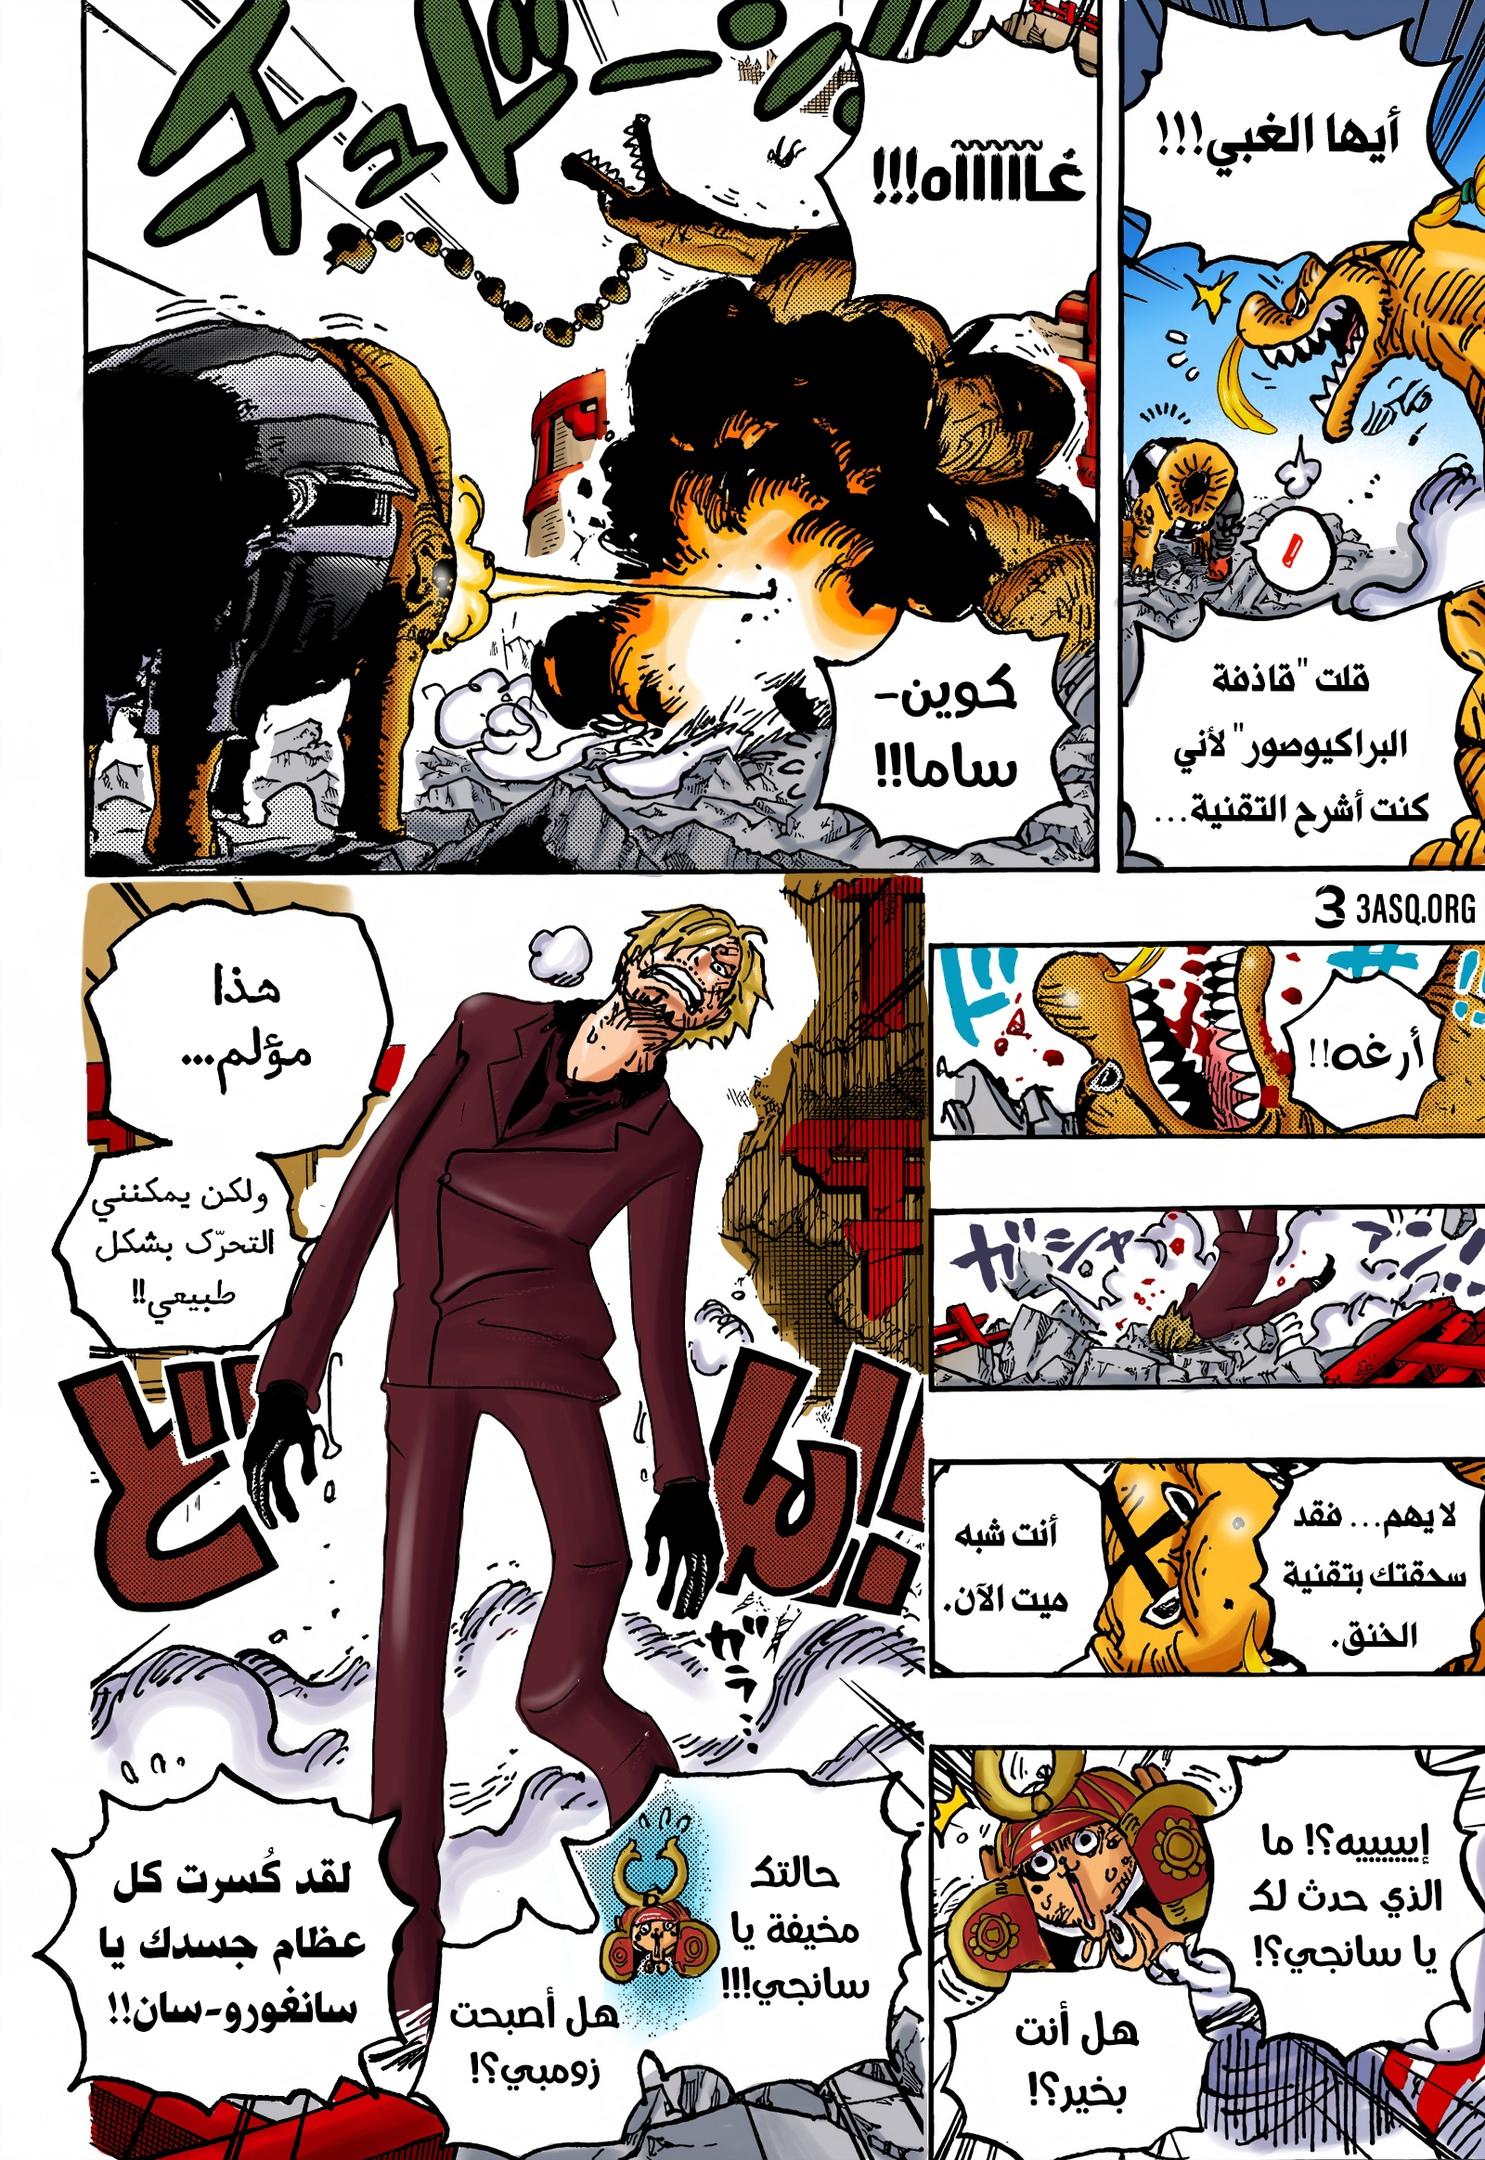 Arab One Piece 1028, image №19